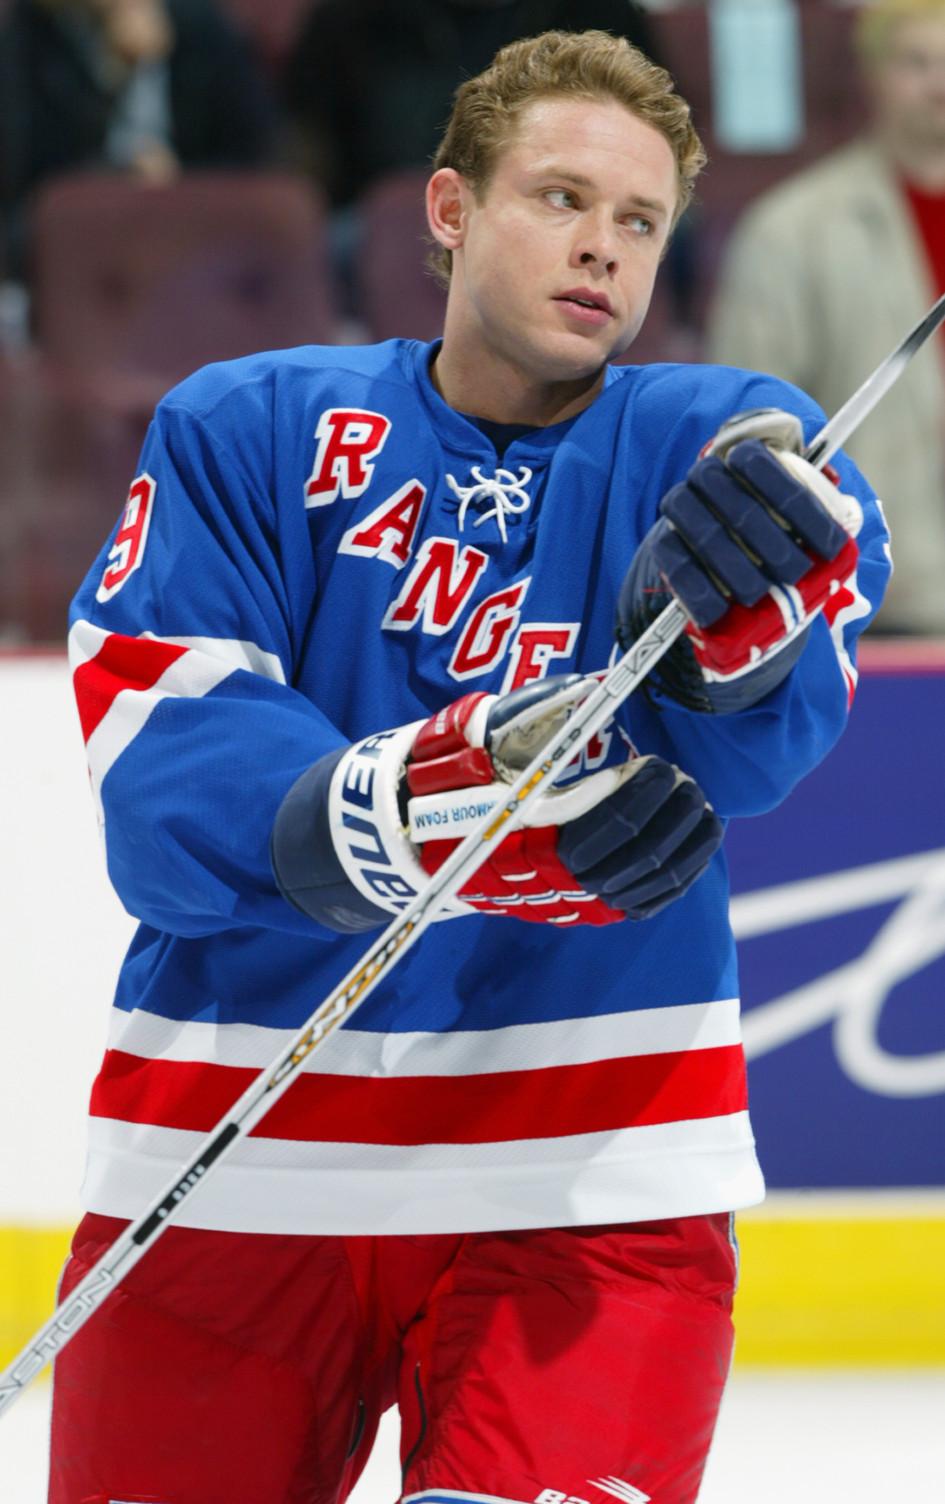 Фото: Jeff Vinnick/Getty Images/NHLI